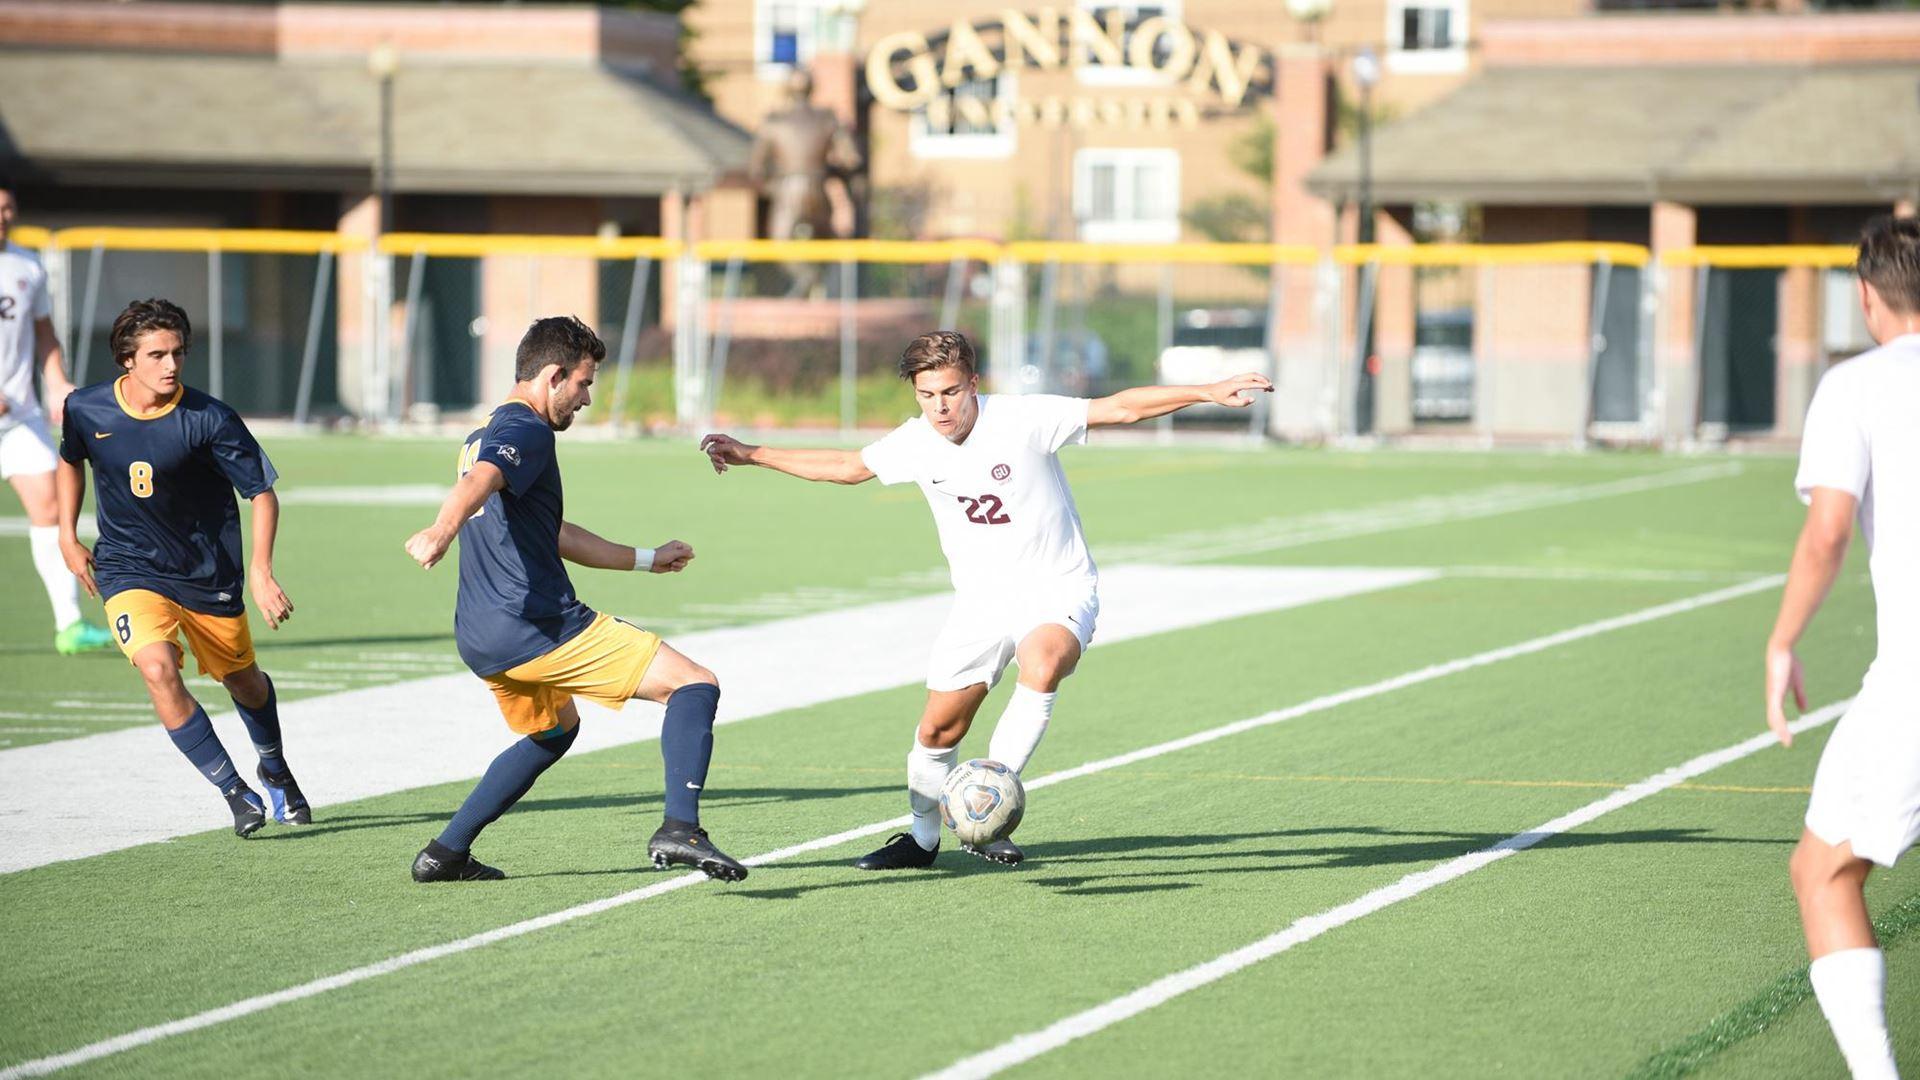 Men's soccer looks to continue current winning streak